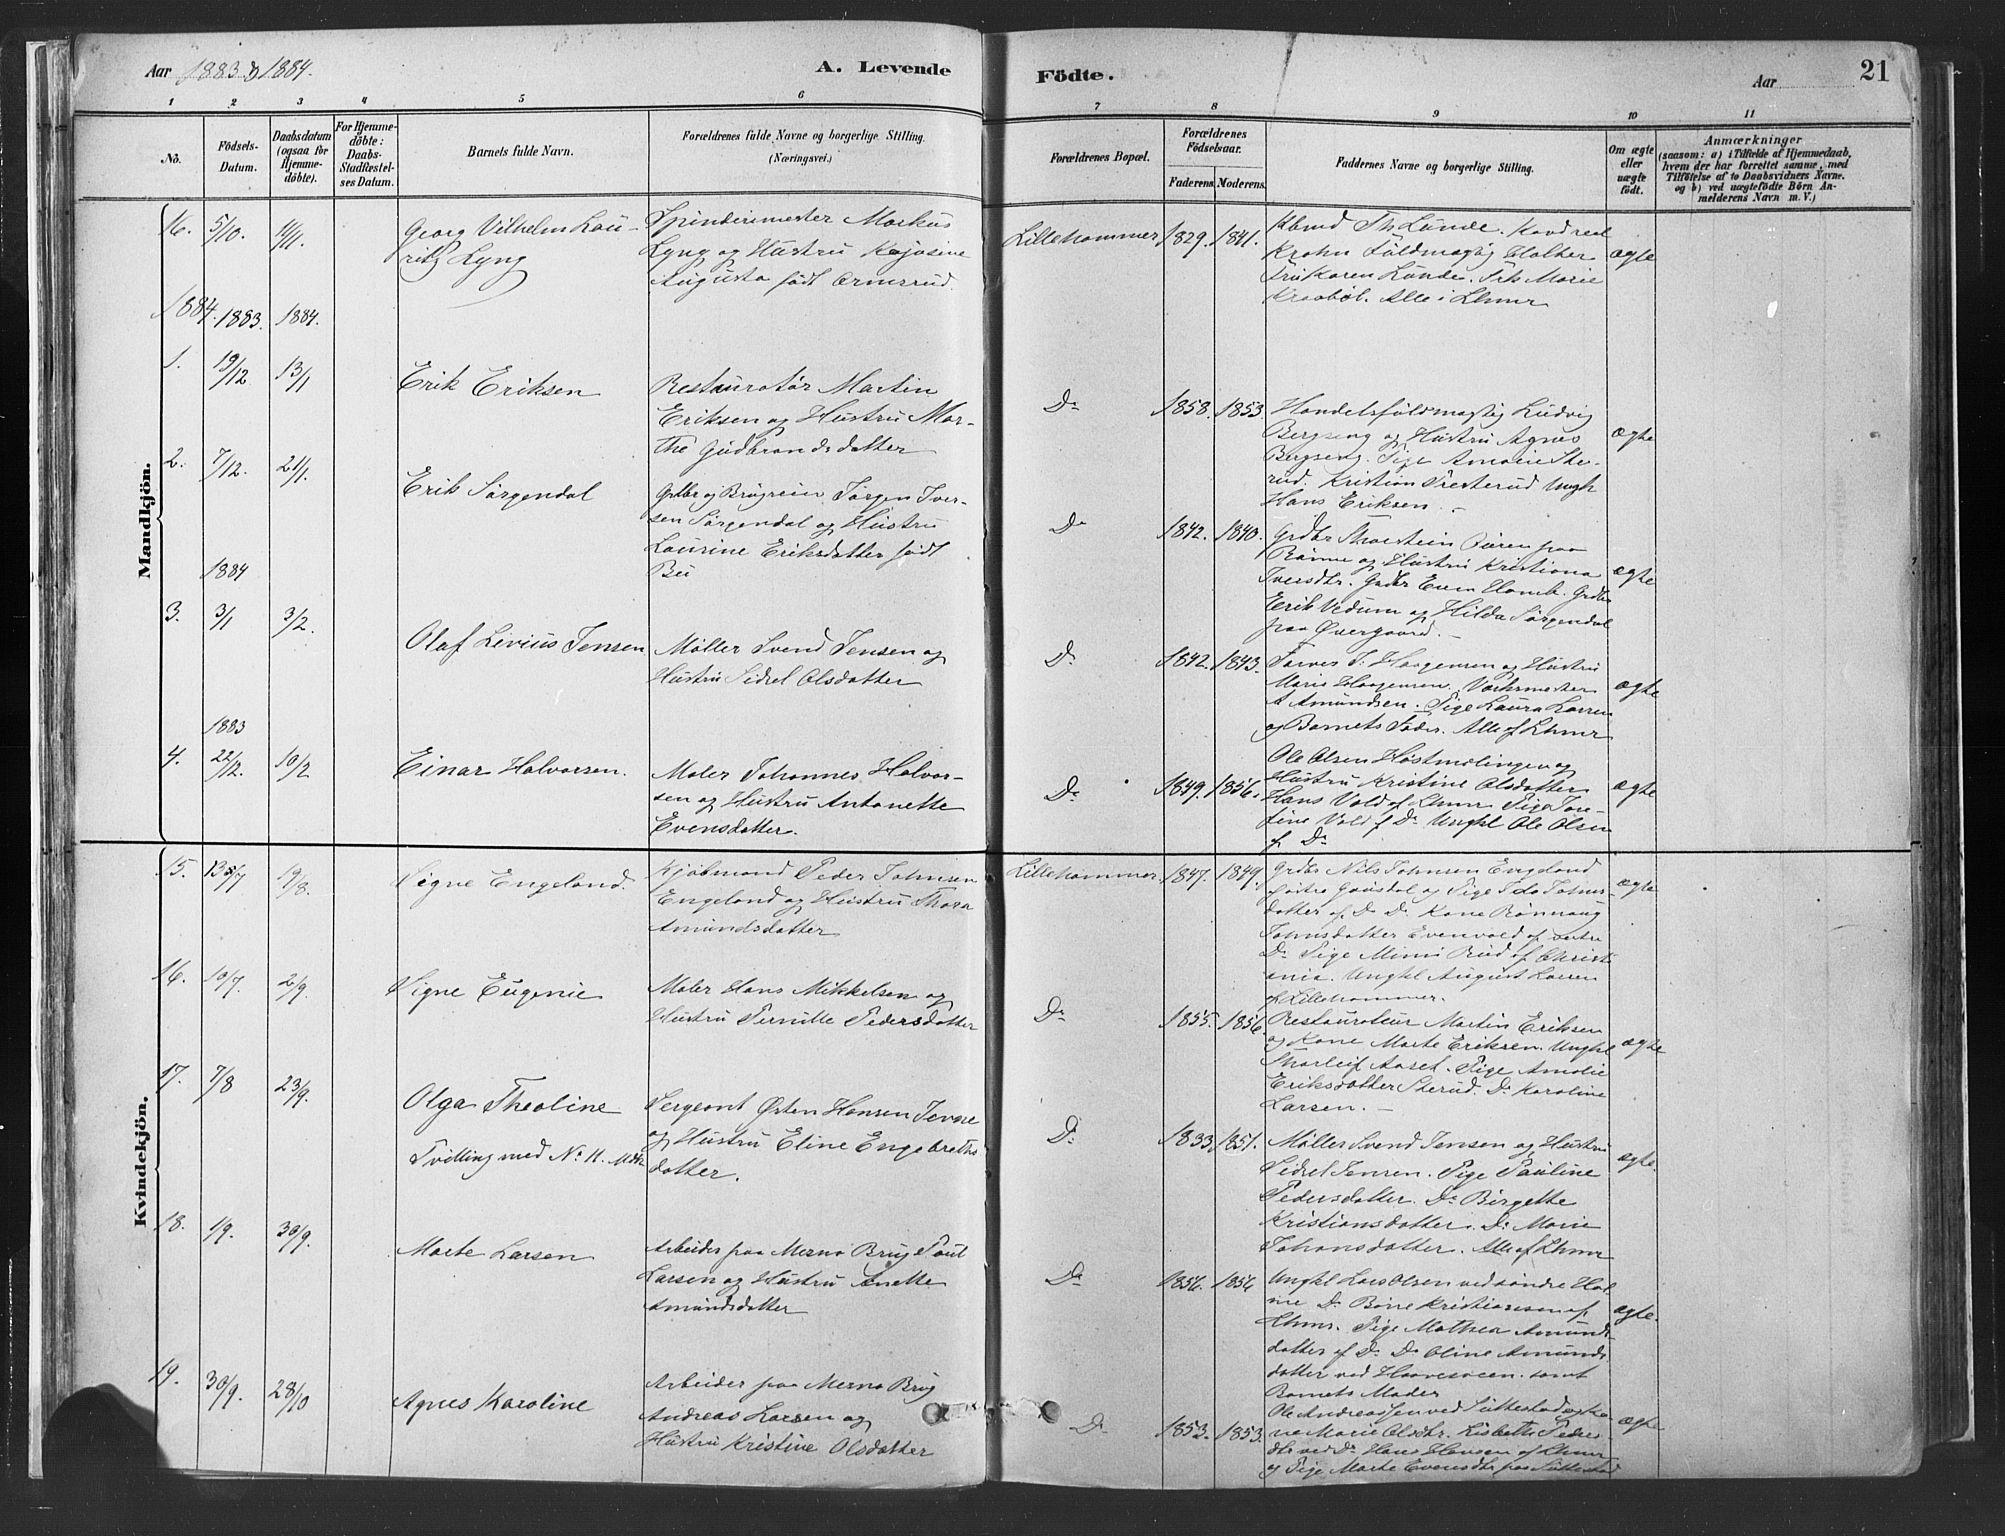 SAH, Fåberg prestekontor, H/Ha/Haa/L0010: Parish register (official) no. 10, 1879-1900, p. 21